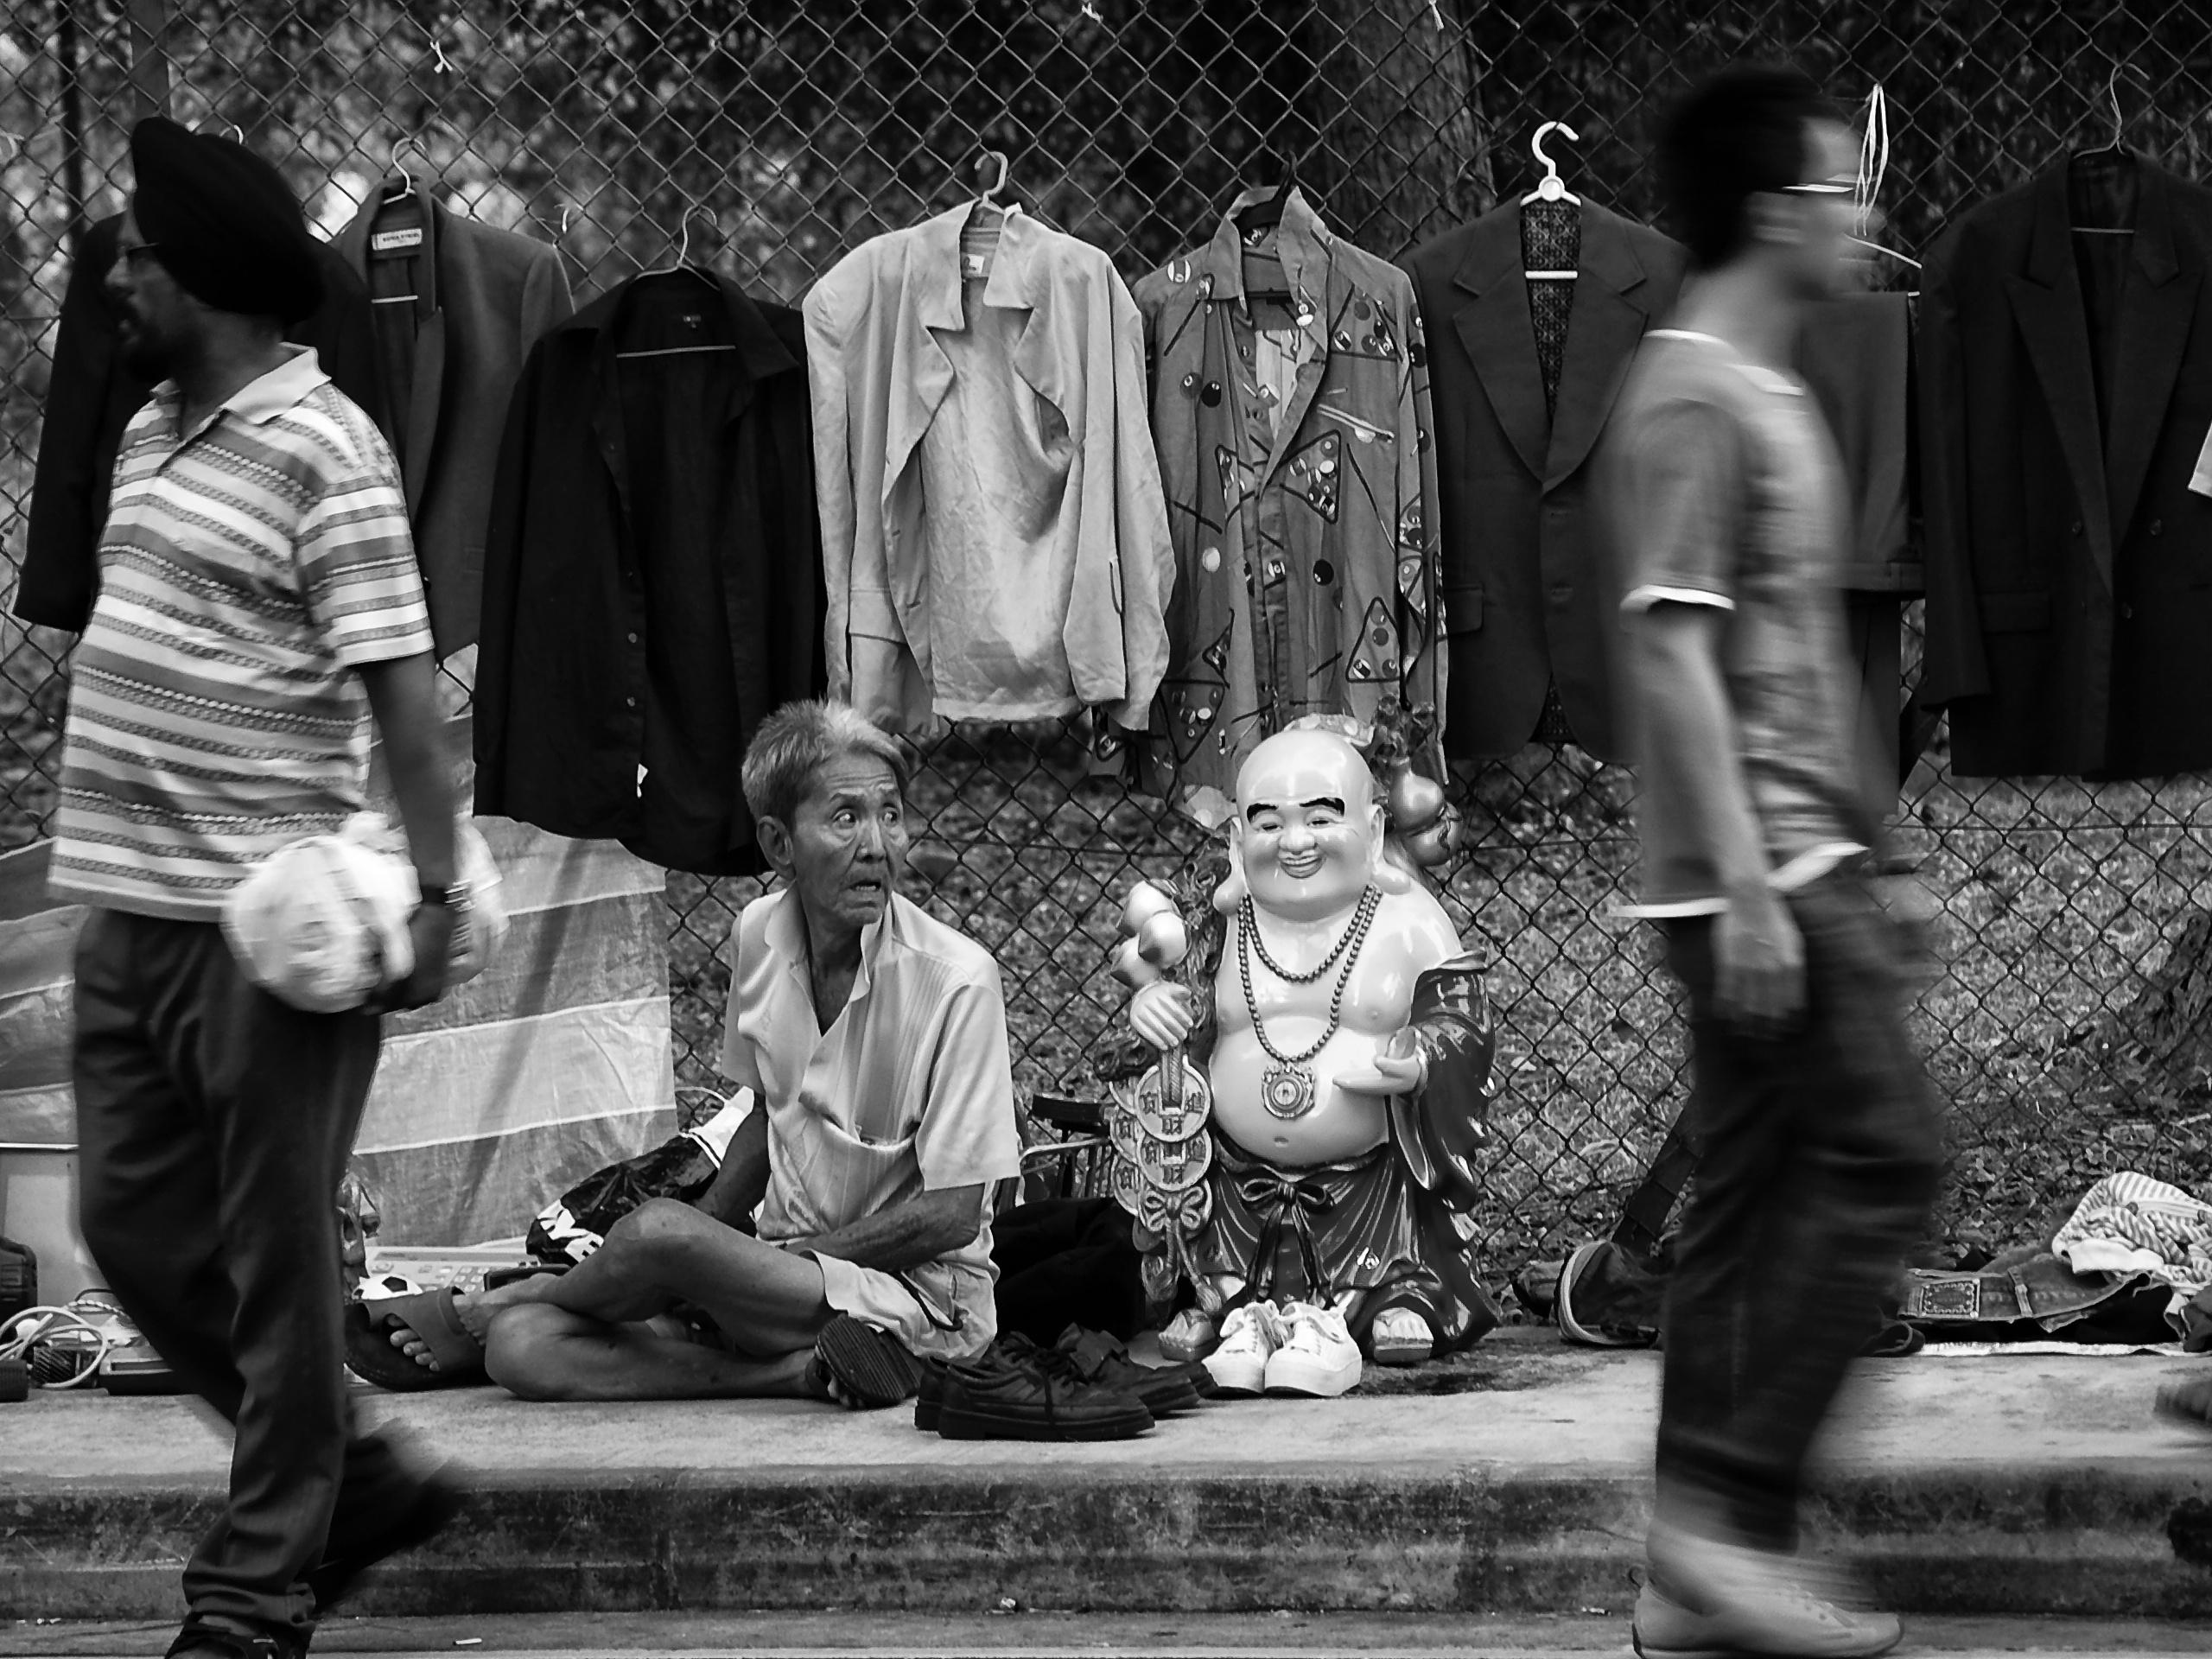 Beside the laughing Buddha, a street scene at Jln Besar market, Singapore